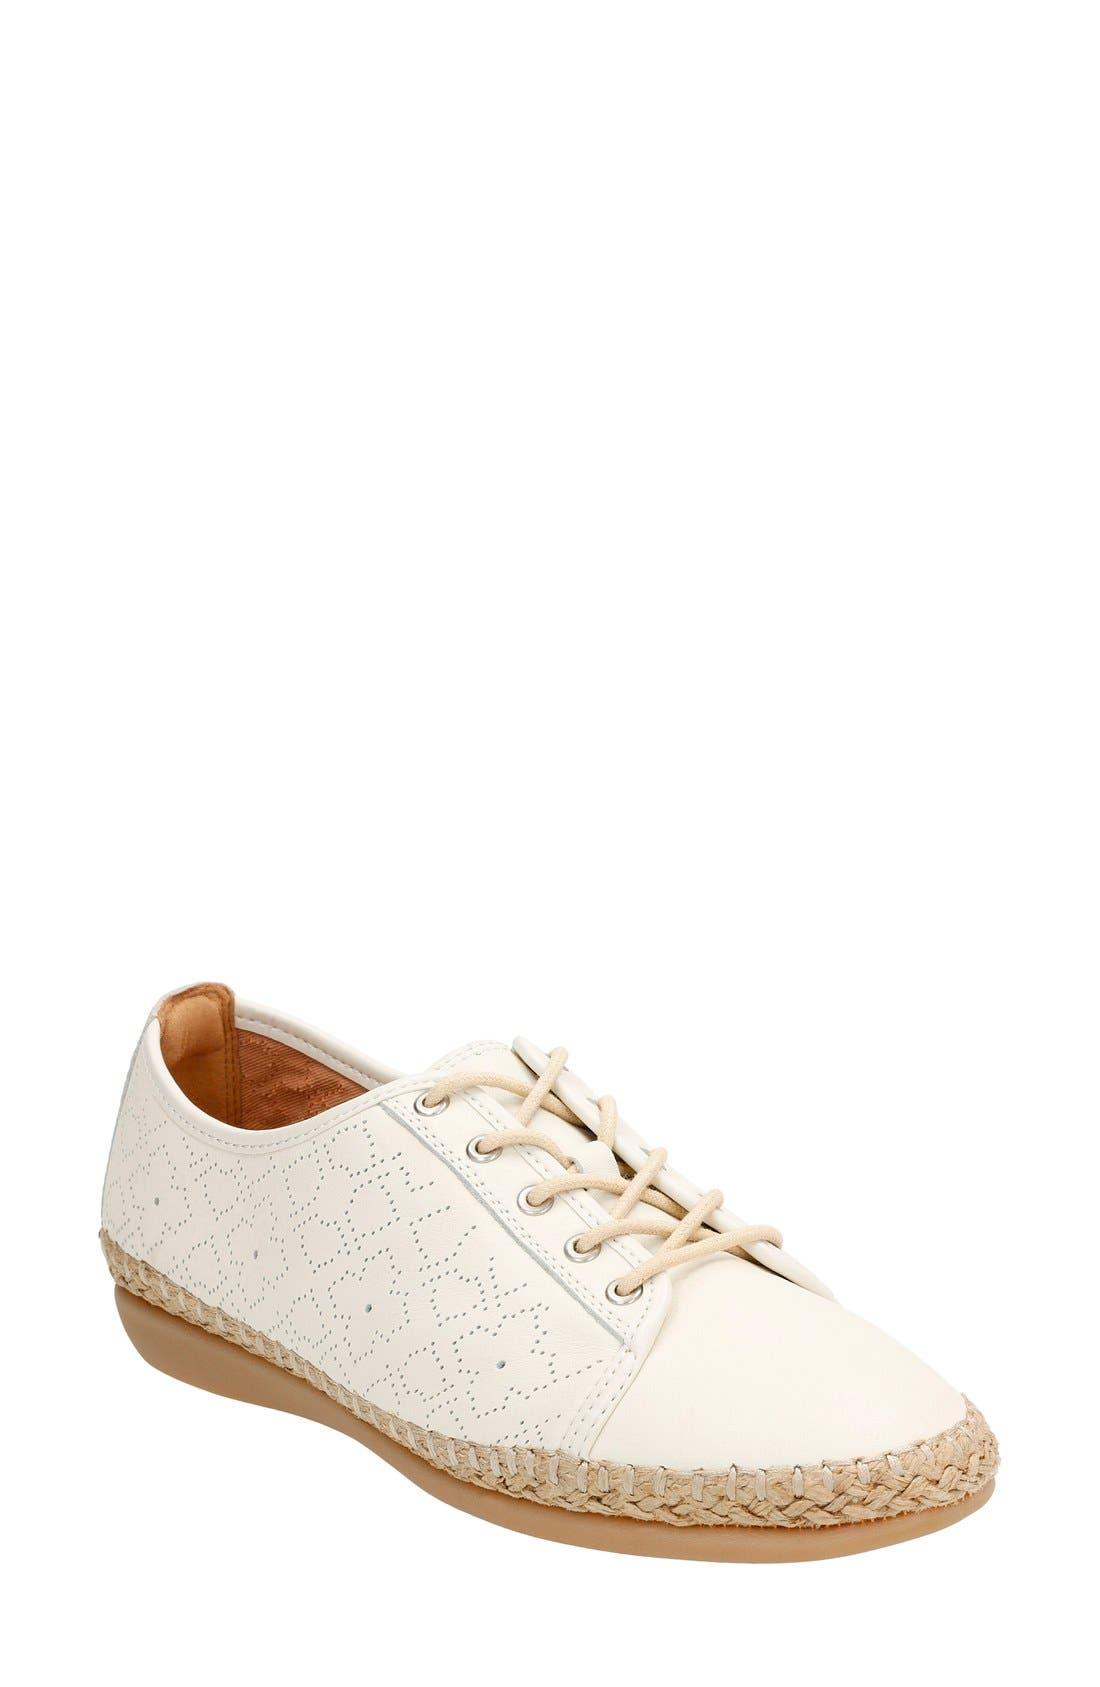 Main Image - Clarks® 'Reeney Rita' Sneaker (Women)